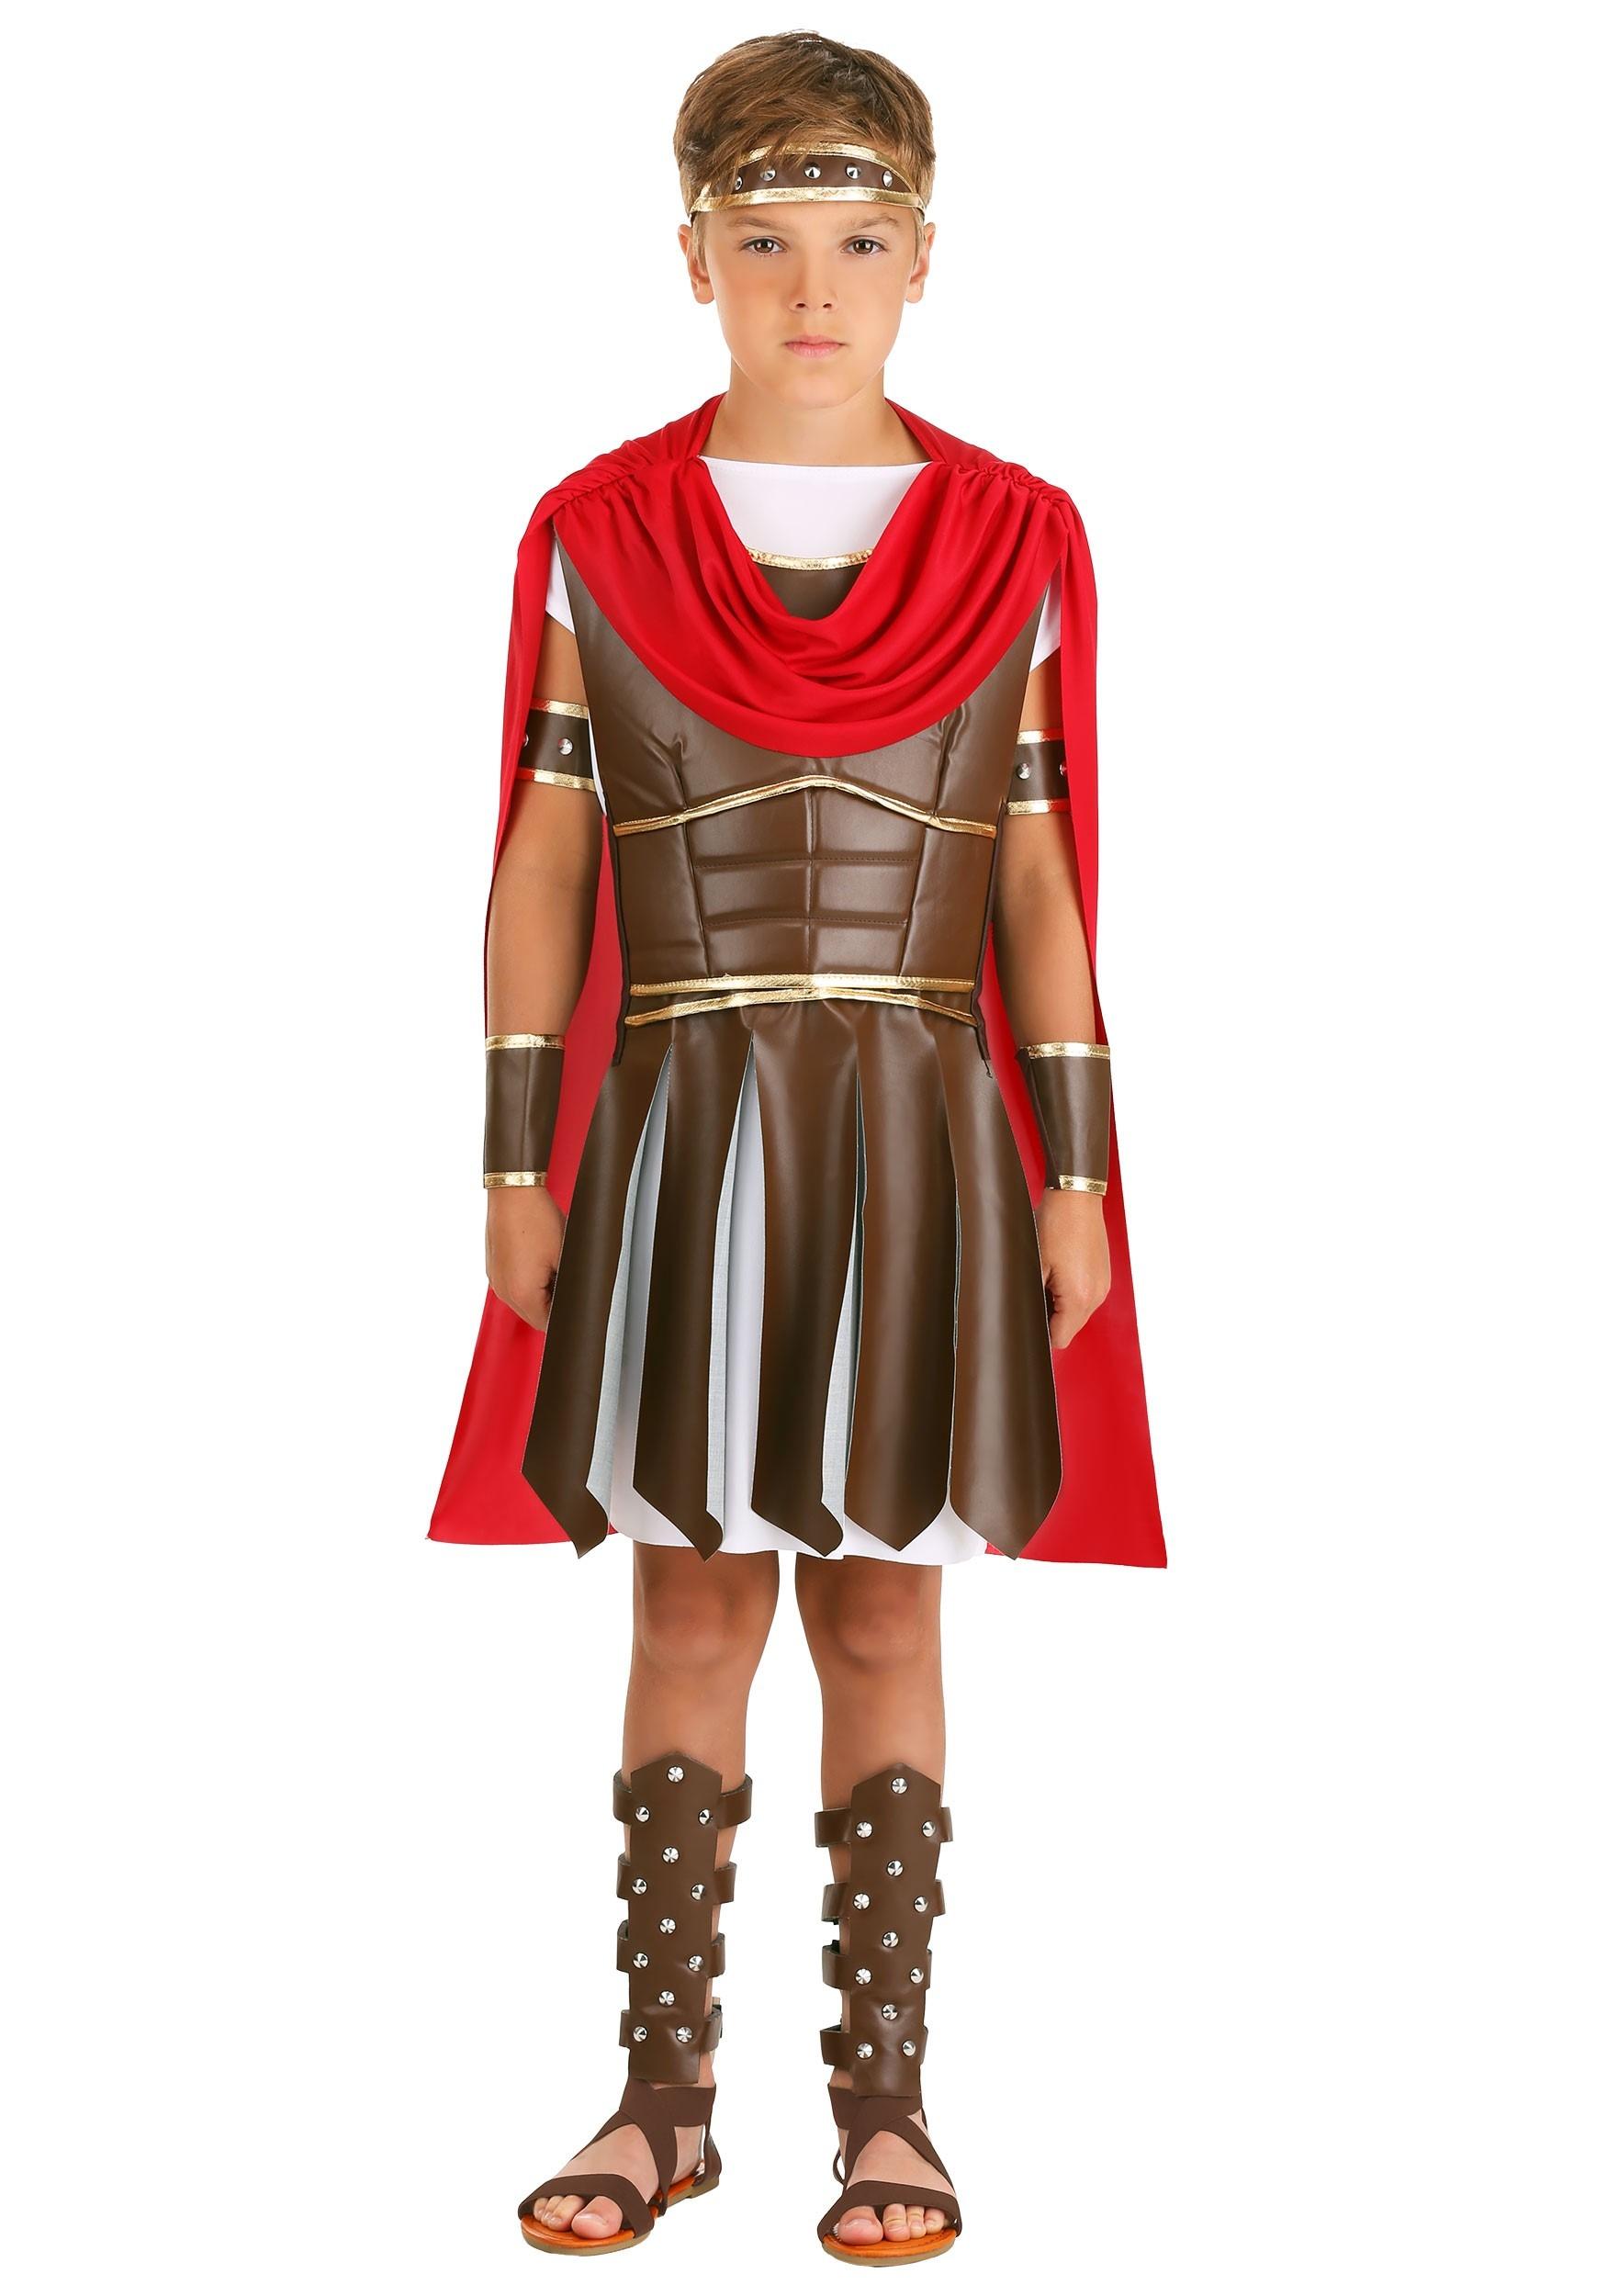 Roman Warrior Costume for Boys